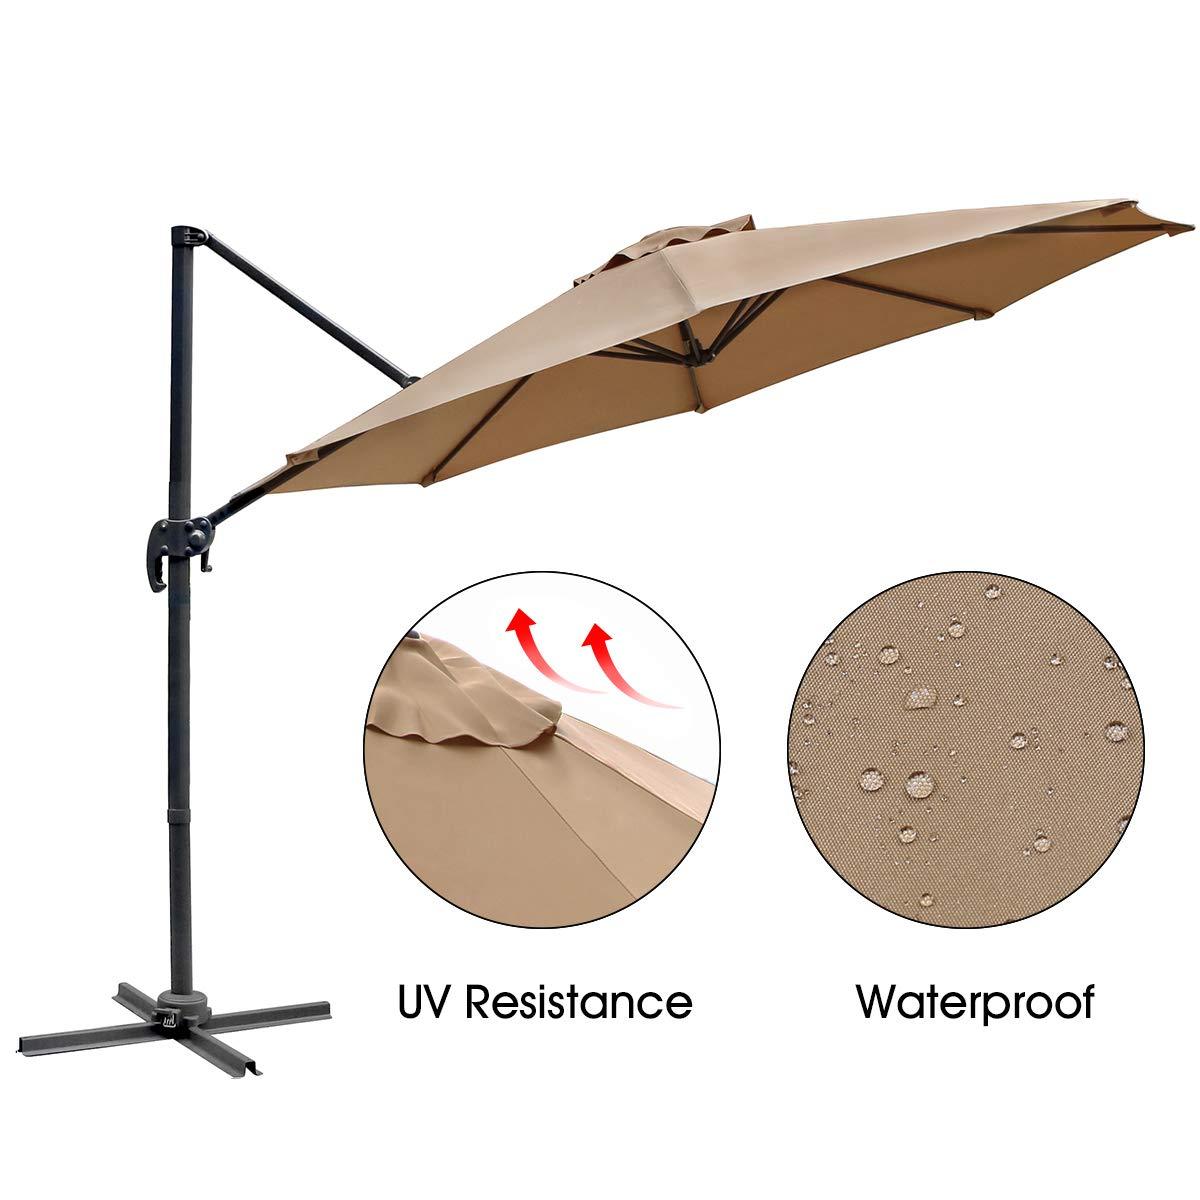 AECOJOY 10ft Cantilever Outdoor Offset Umbrella Patio Umbrella 360 Degree Rotation, Beige